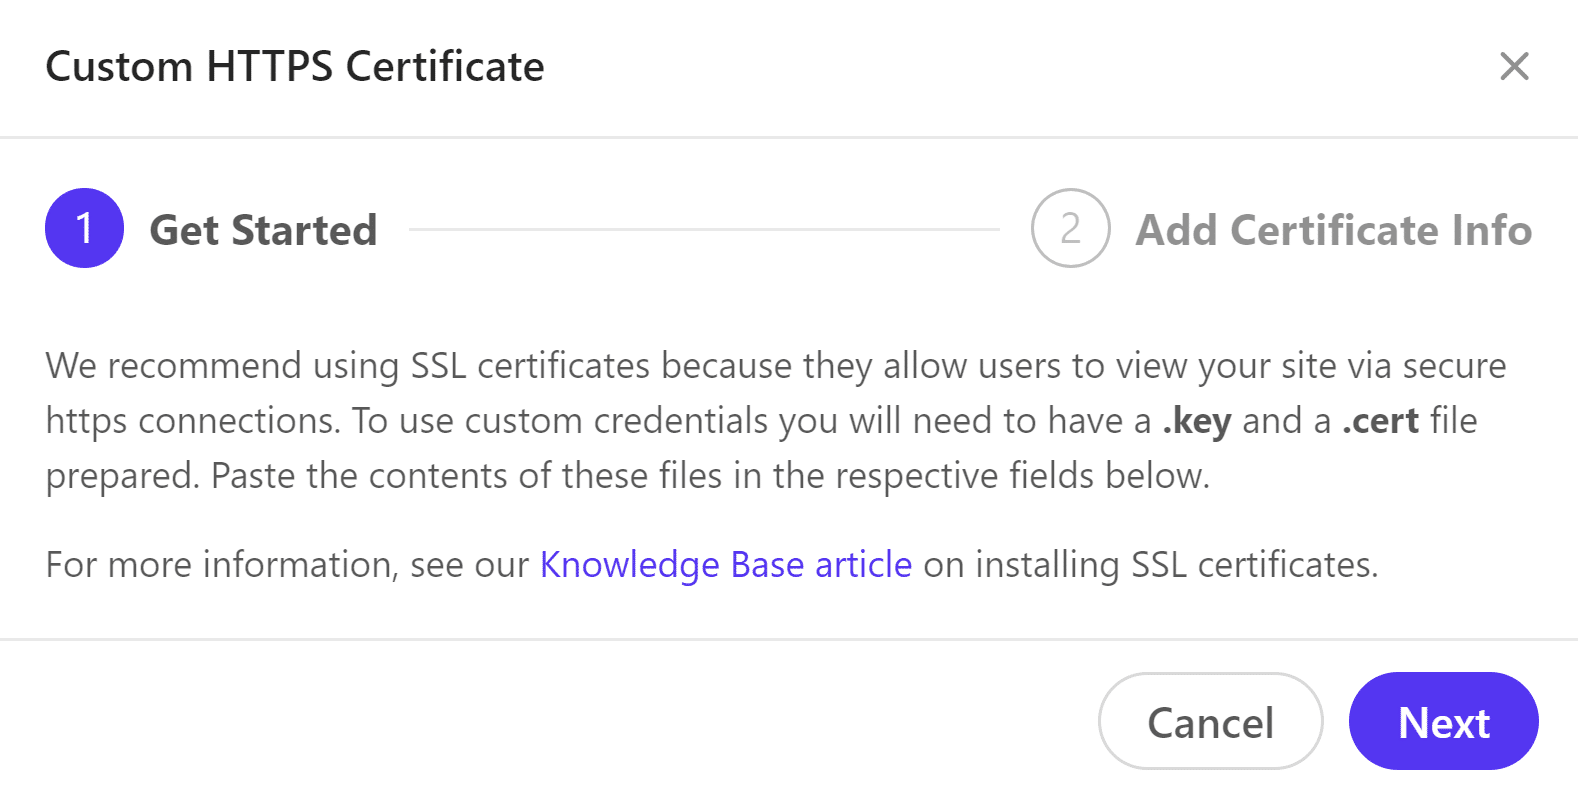 Anpassade HTTPS-autentiseringsuppgifter